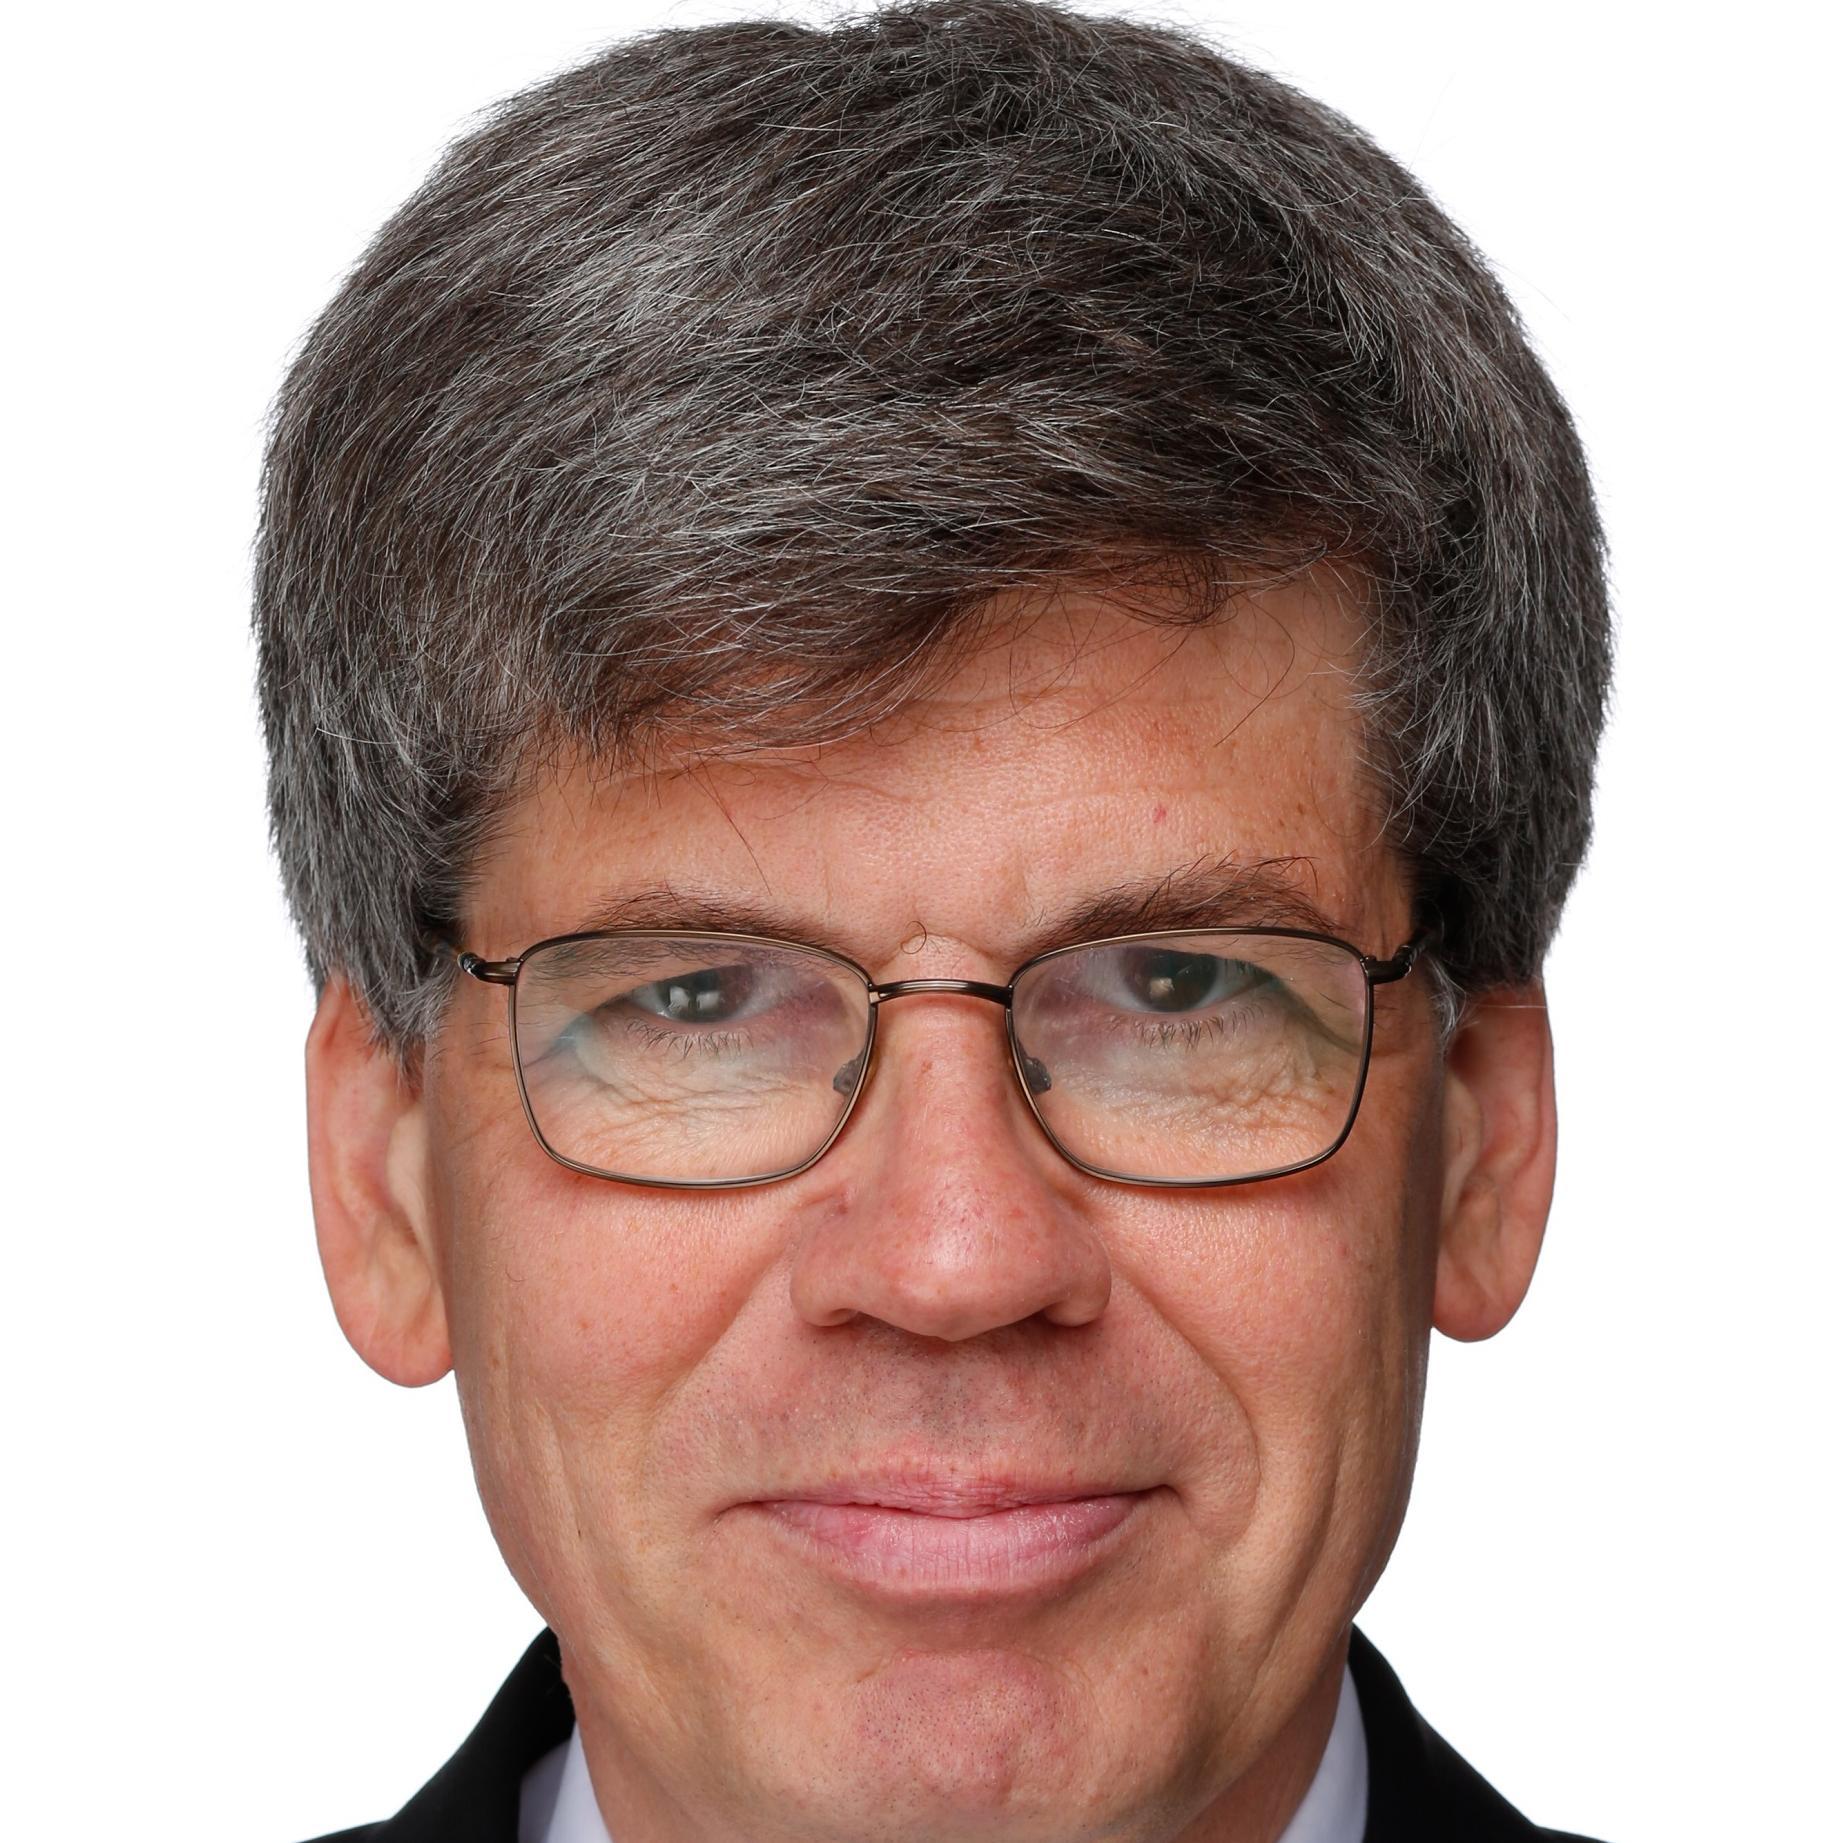 Daniel Frohriep-Ichihara